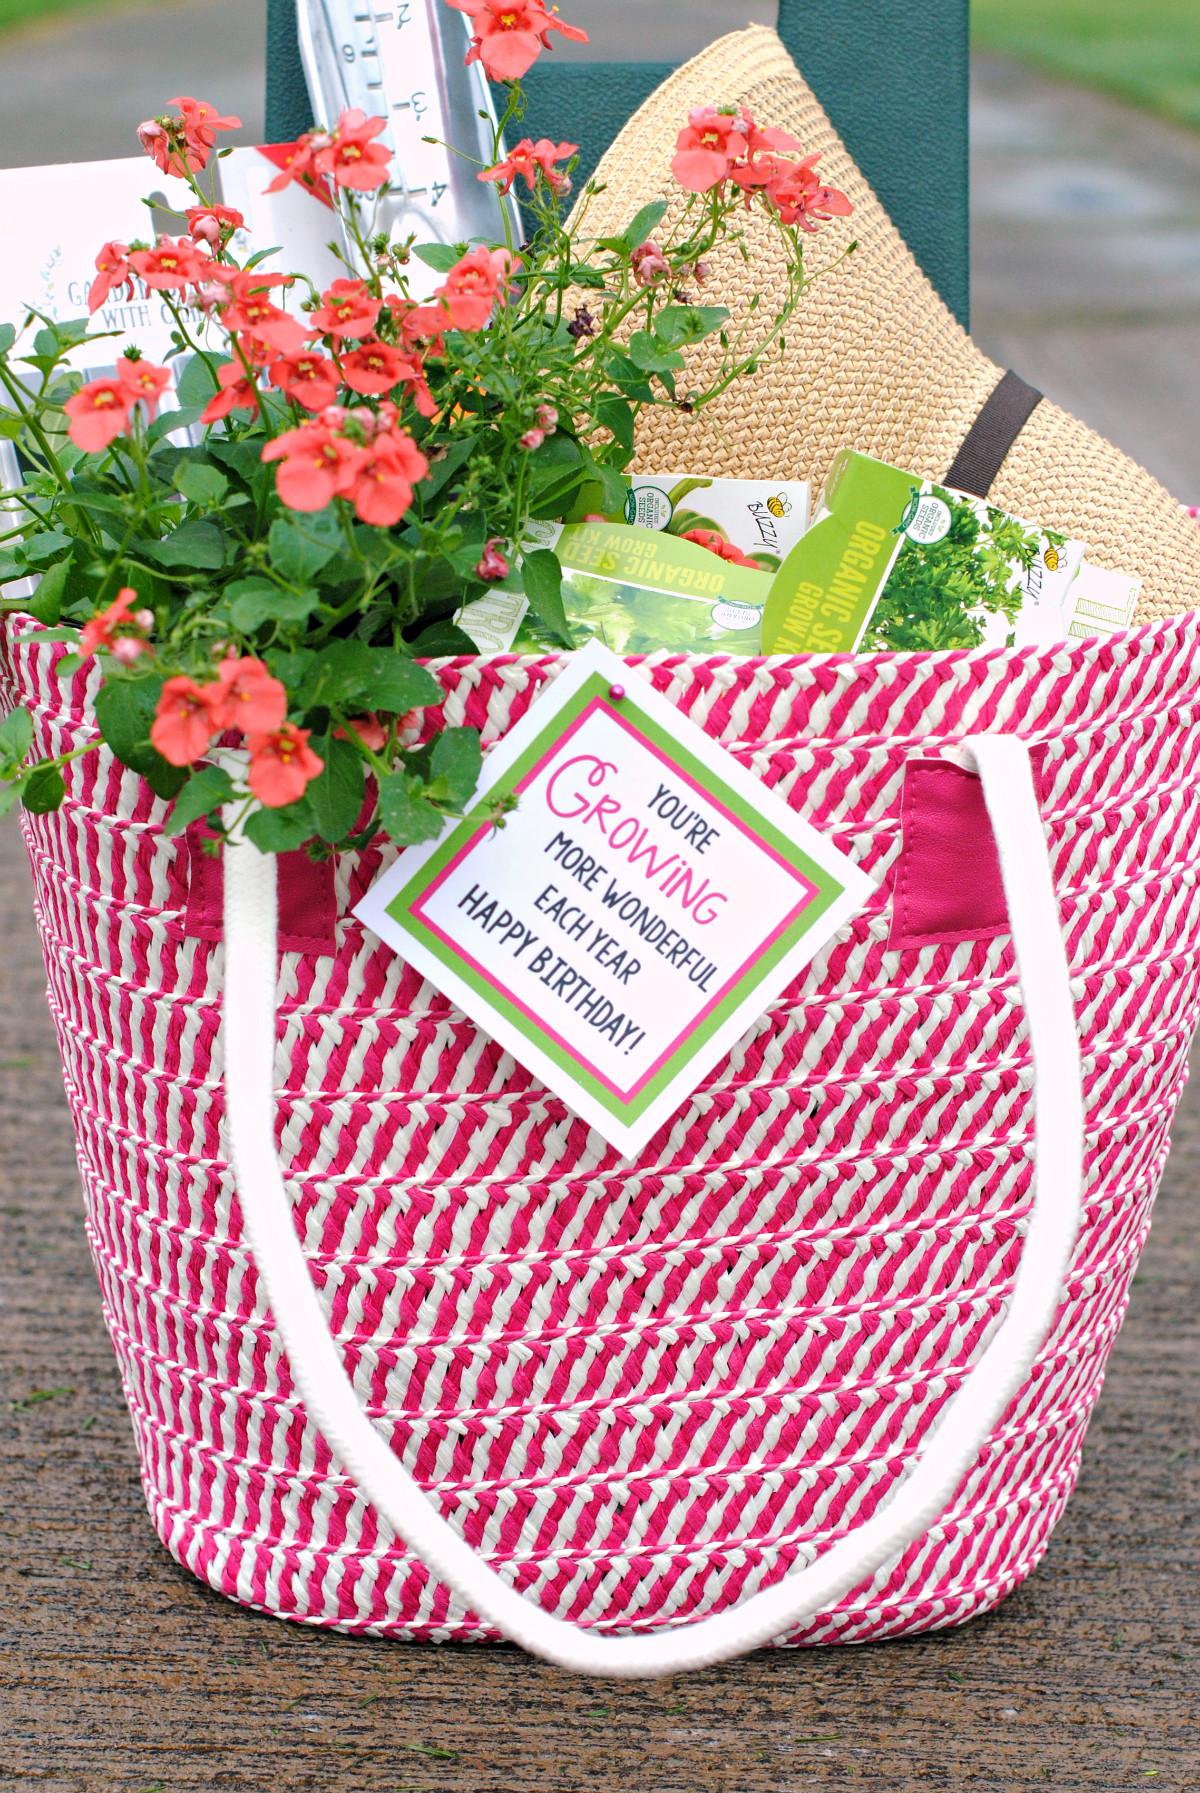 Garden Themed Gift Basket Ideas  Fun Gardening Gift Basket Idea – Fun Squared